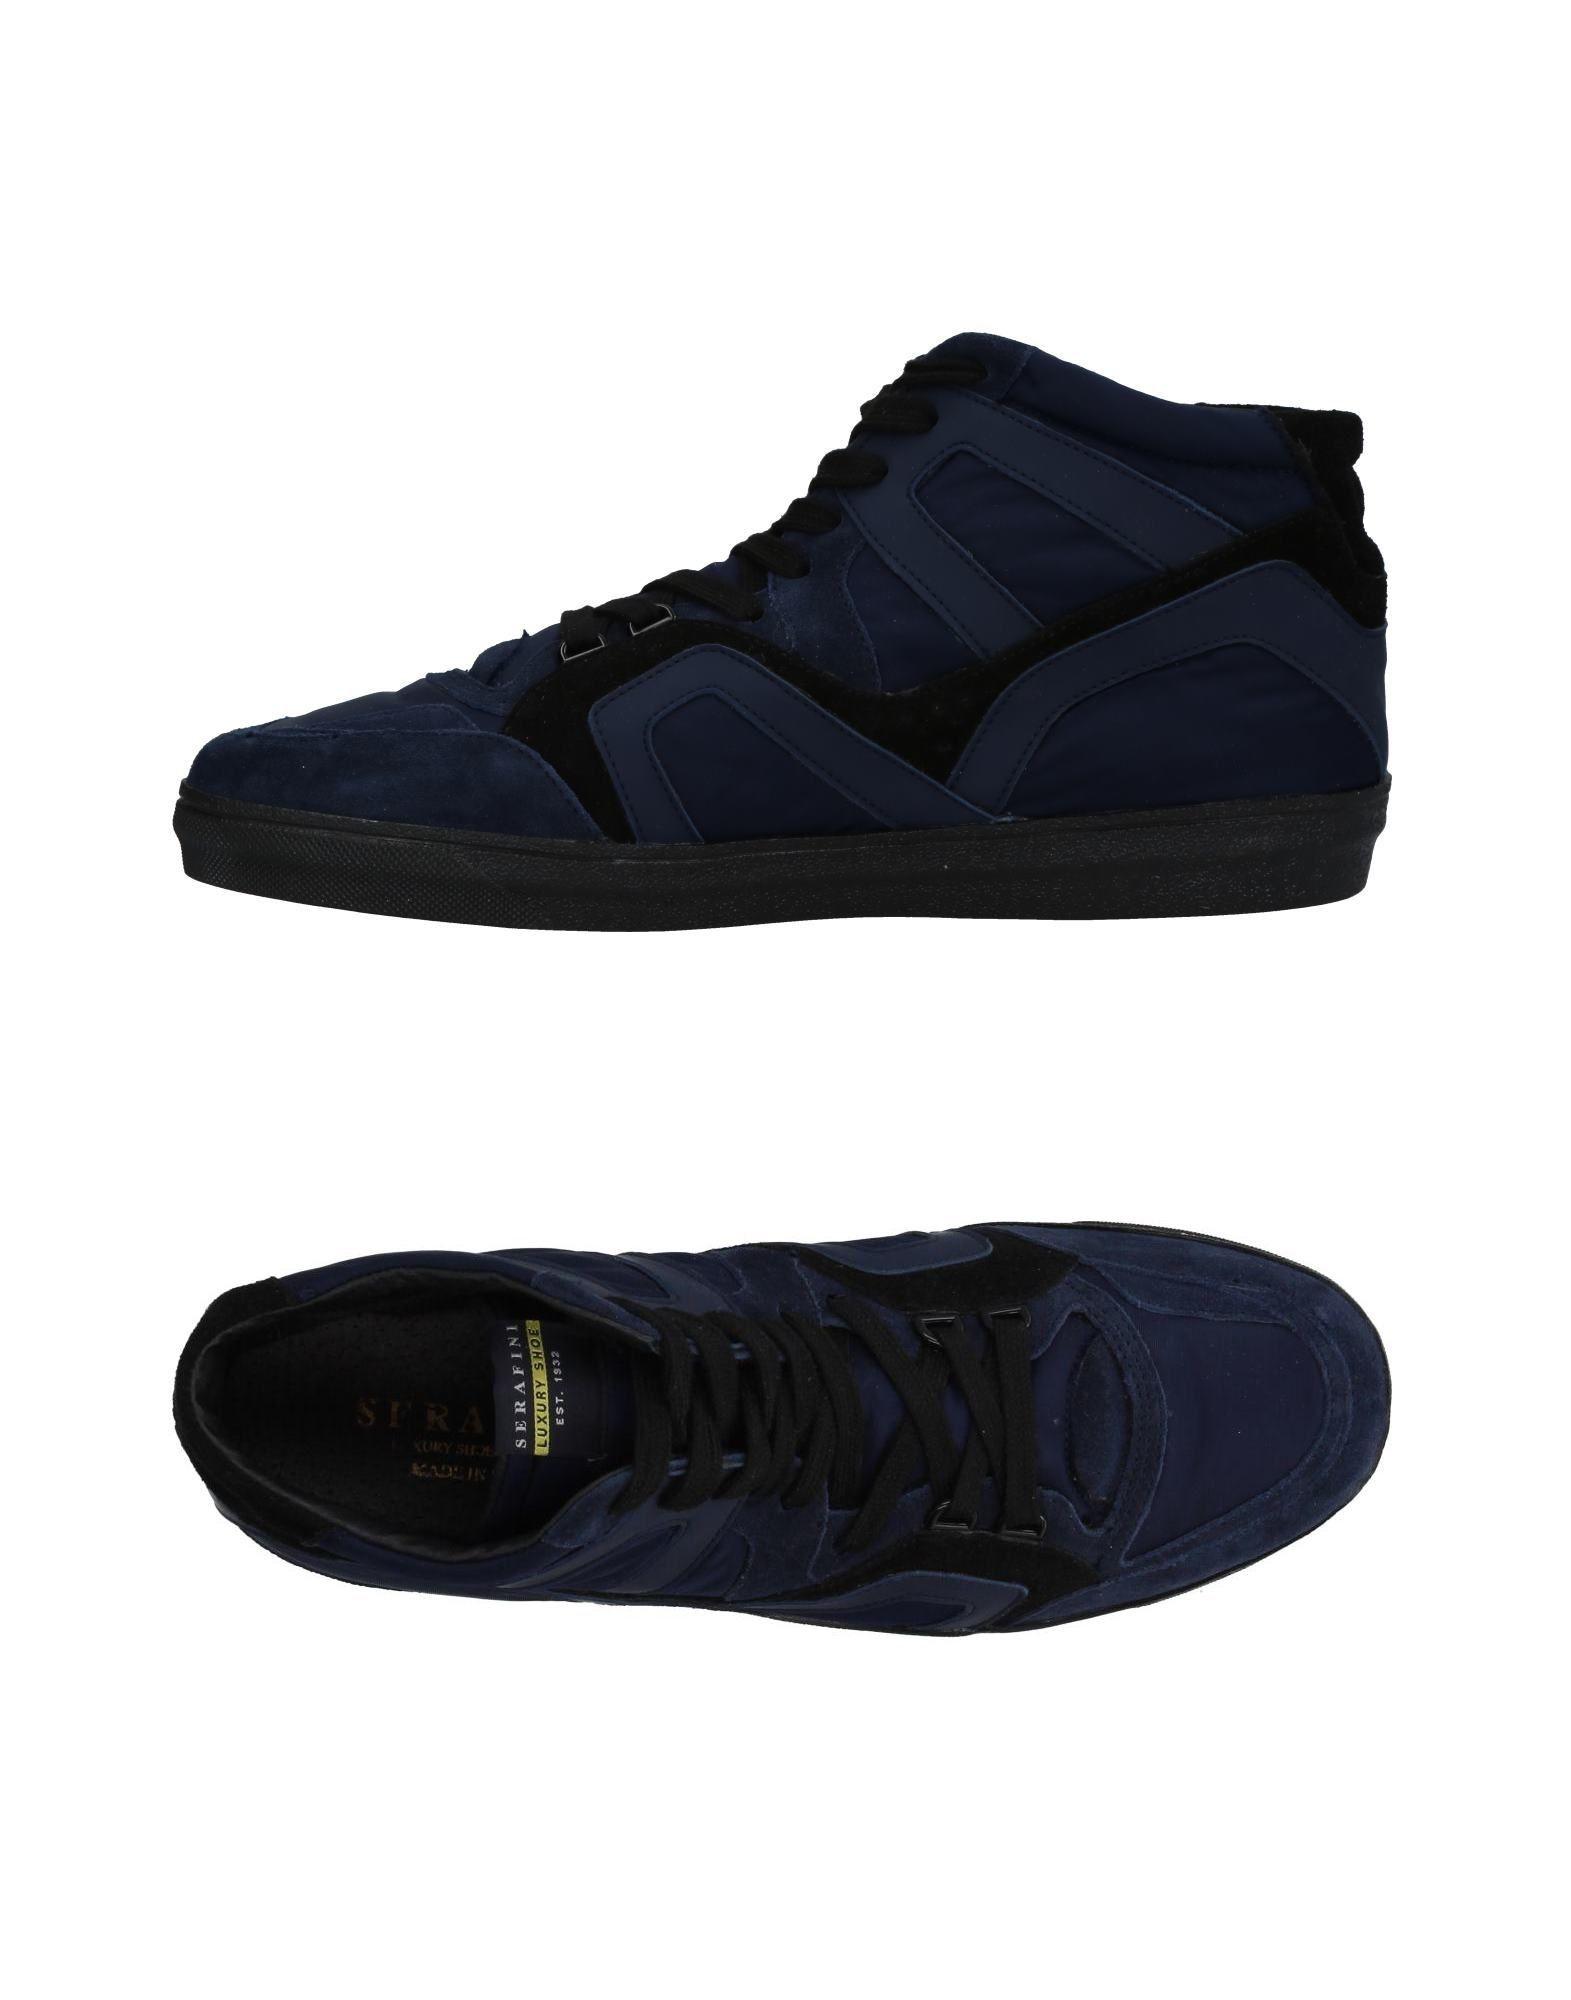 SERAFINI LUXURY Herren High Sneakers & Tennisschuhe Farbe Dunkelblau Größe 9 - broschei